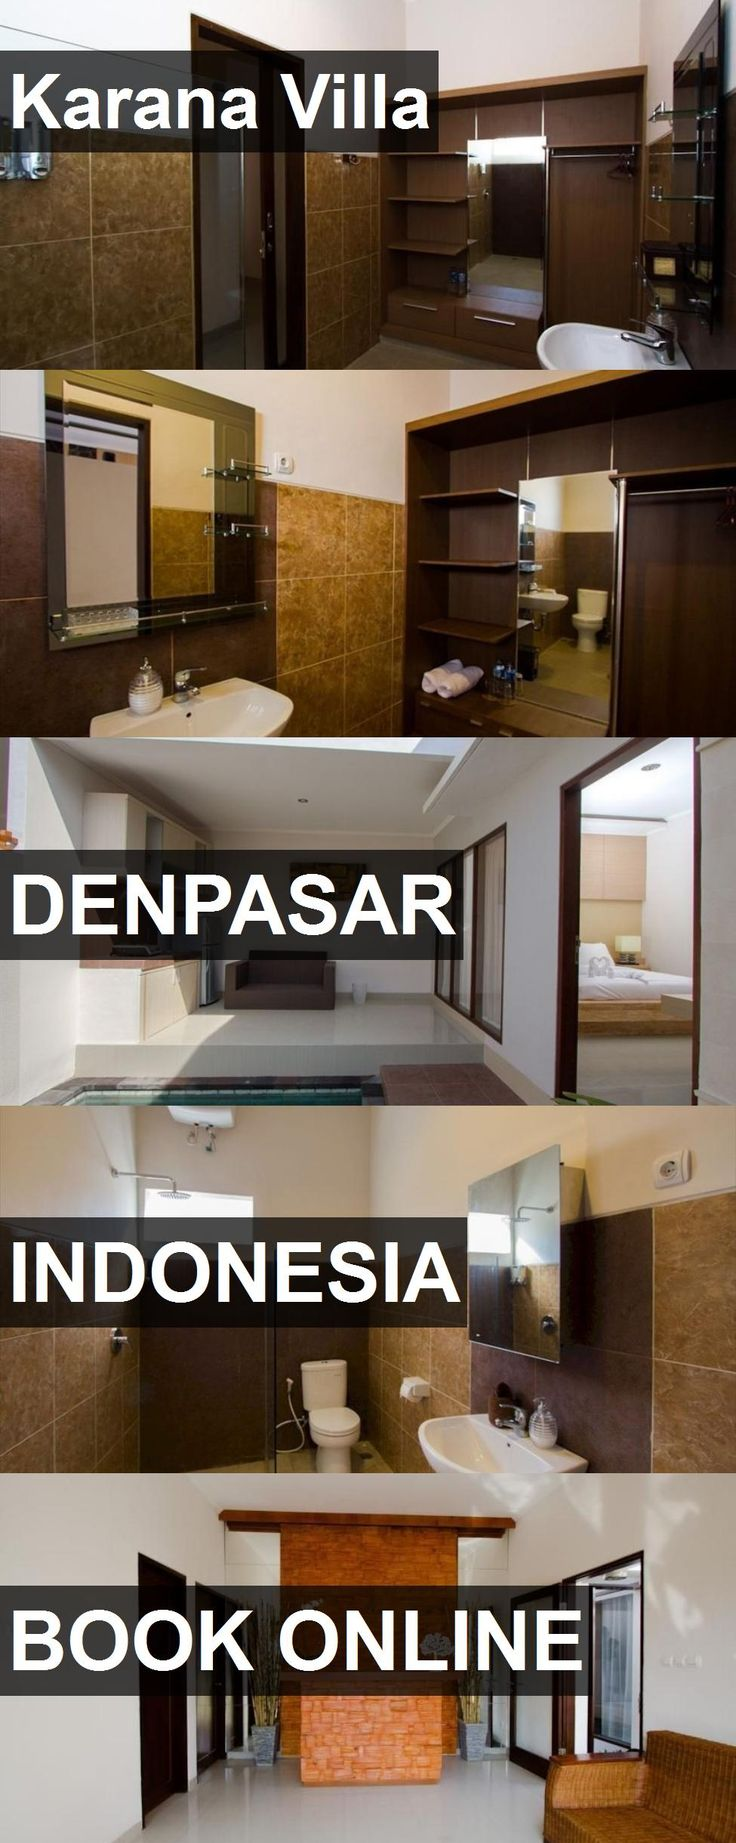 Hotel Karana Villa In Denpasar Indonesia For More Information Photos Reviews And